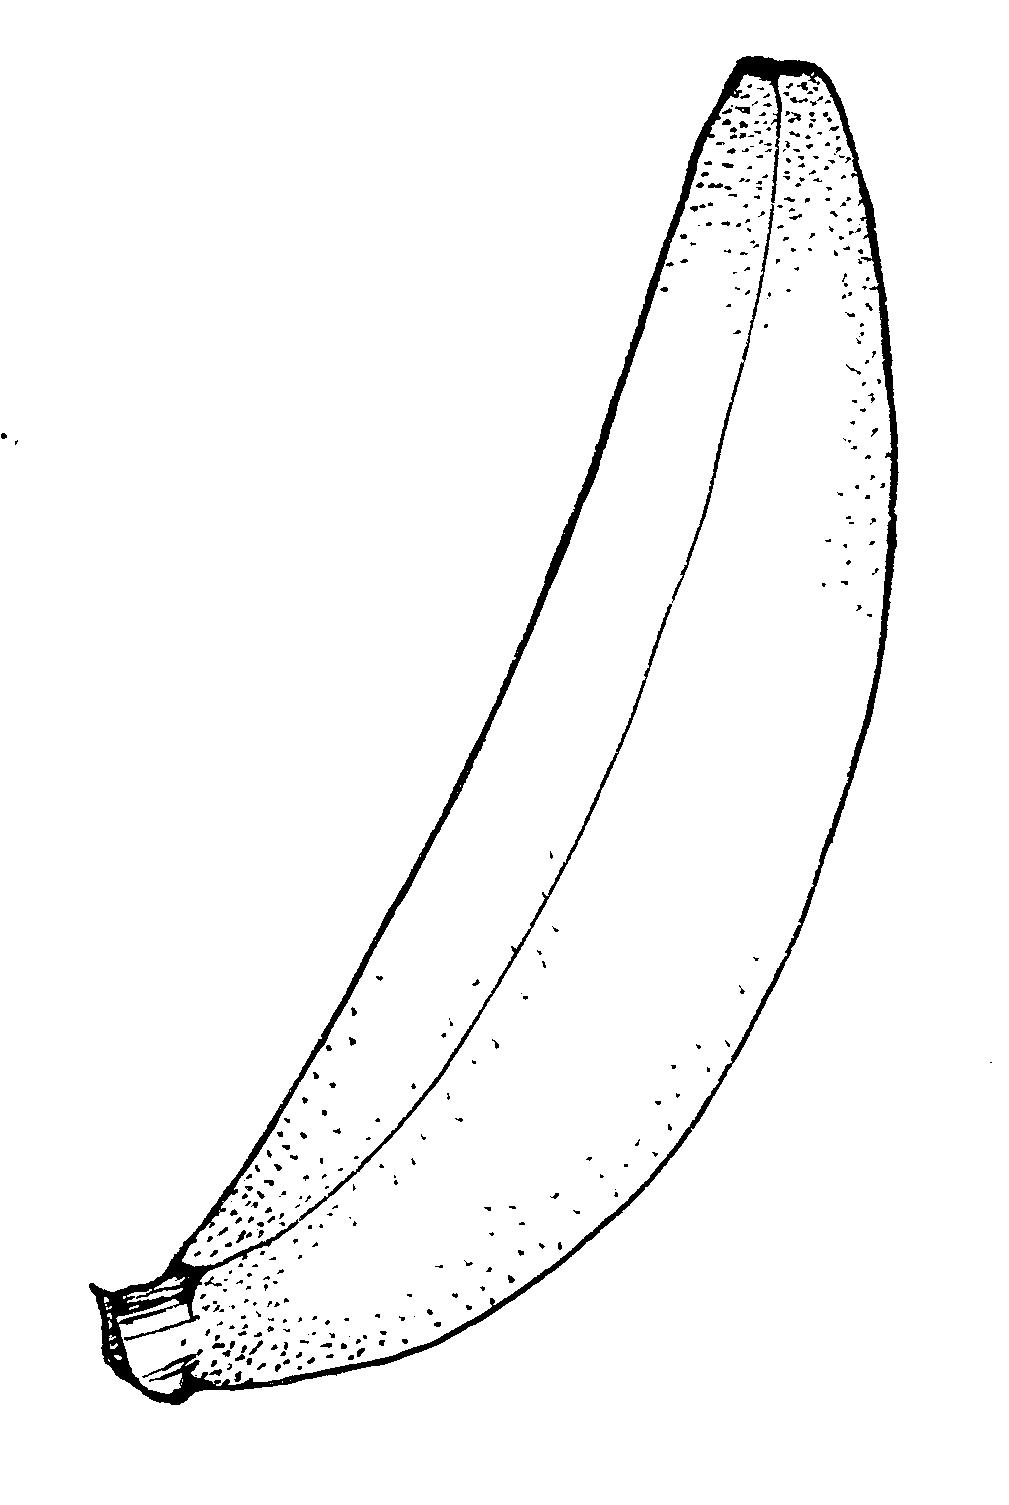 Banana clipart orange fruit And Fruit white black 4